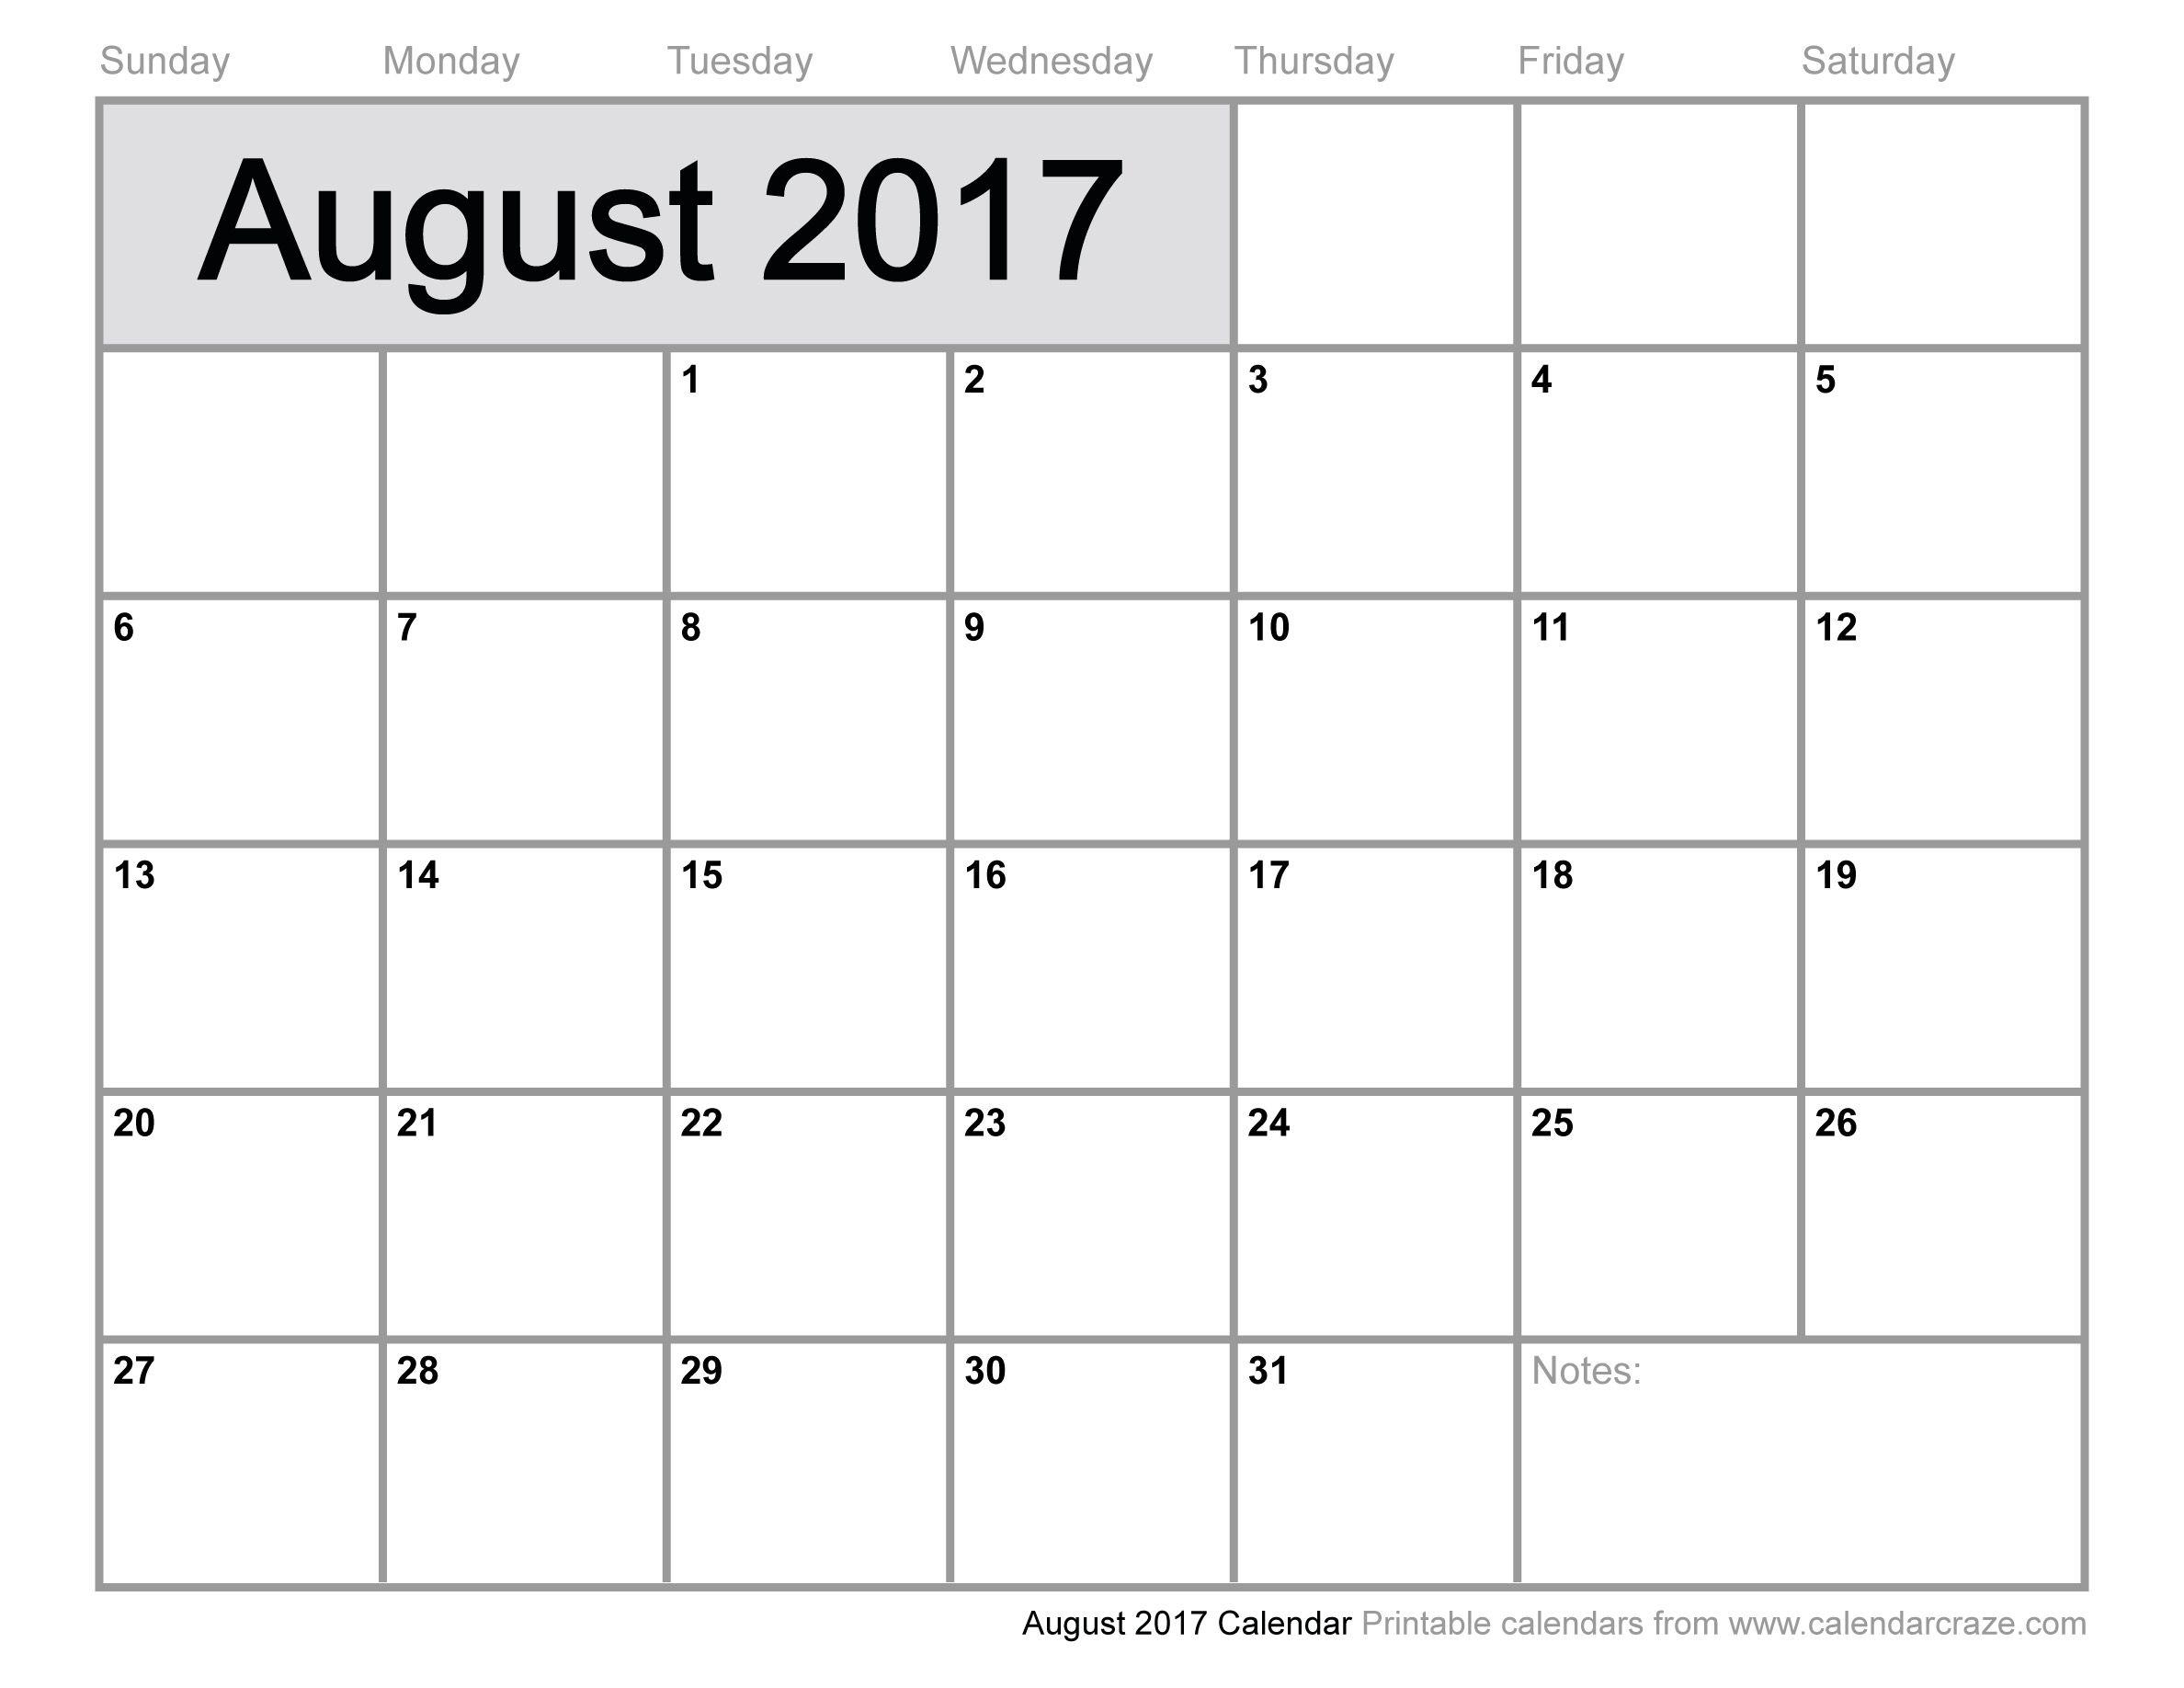 august 2017 calendar uk, august 2017 uk calendar, august calendar uk ...